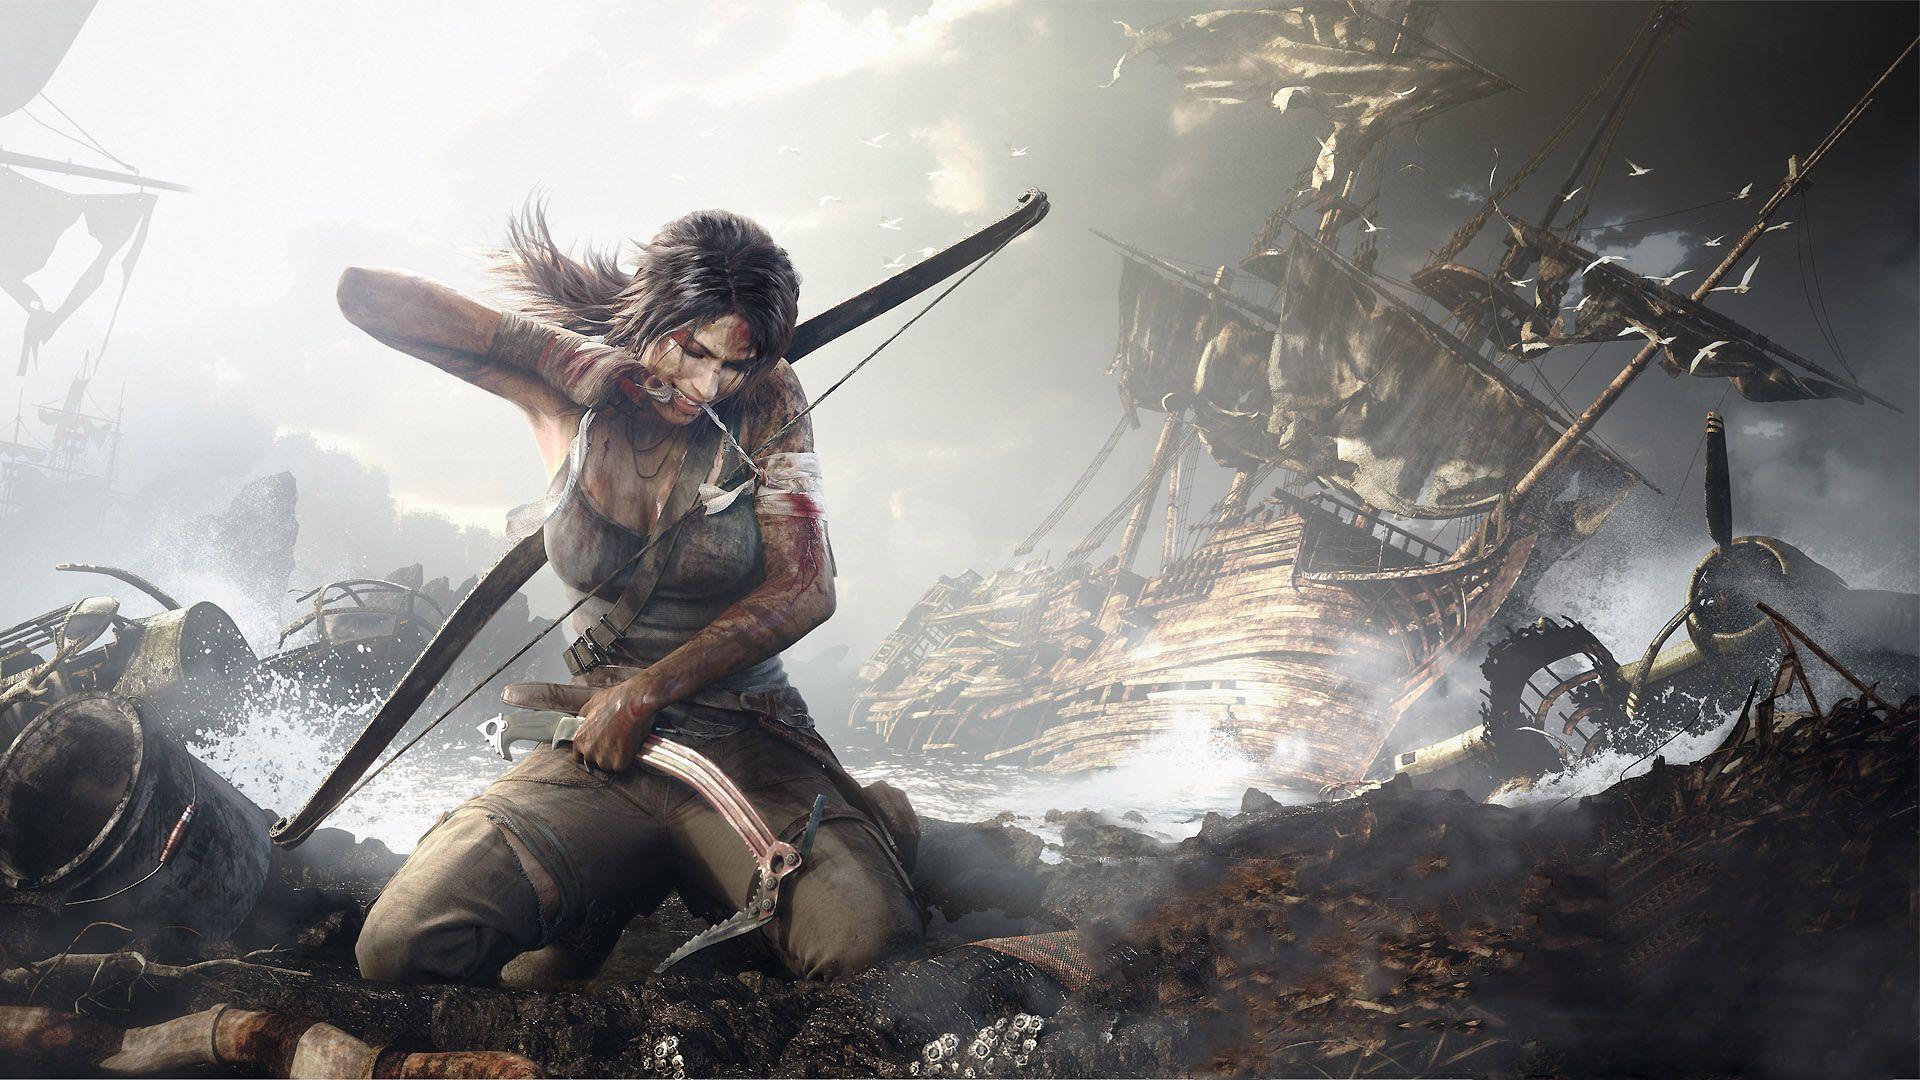 Img 572582 Jpg 1920 1080 Tomb Raider Artwork Tomb Raider Tomb Raider Wallpaper